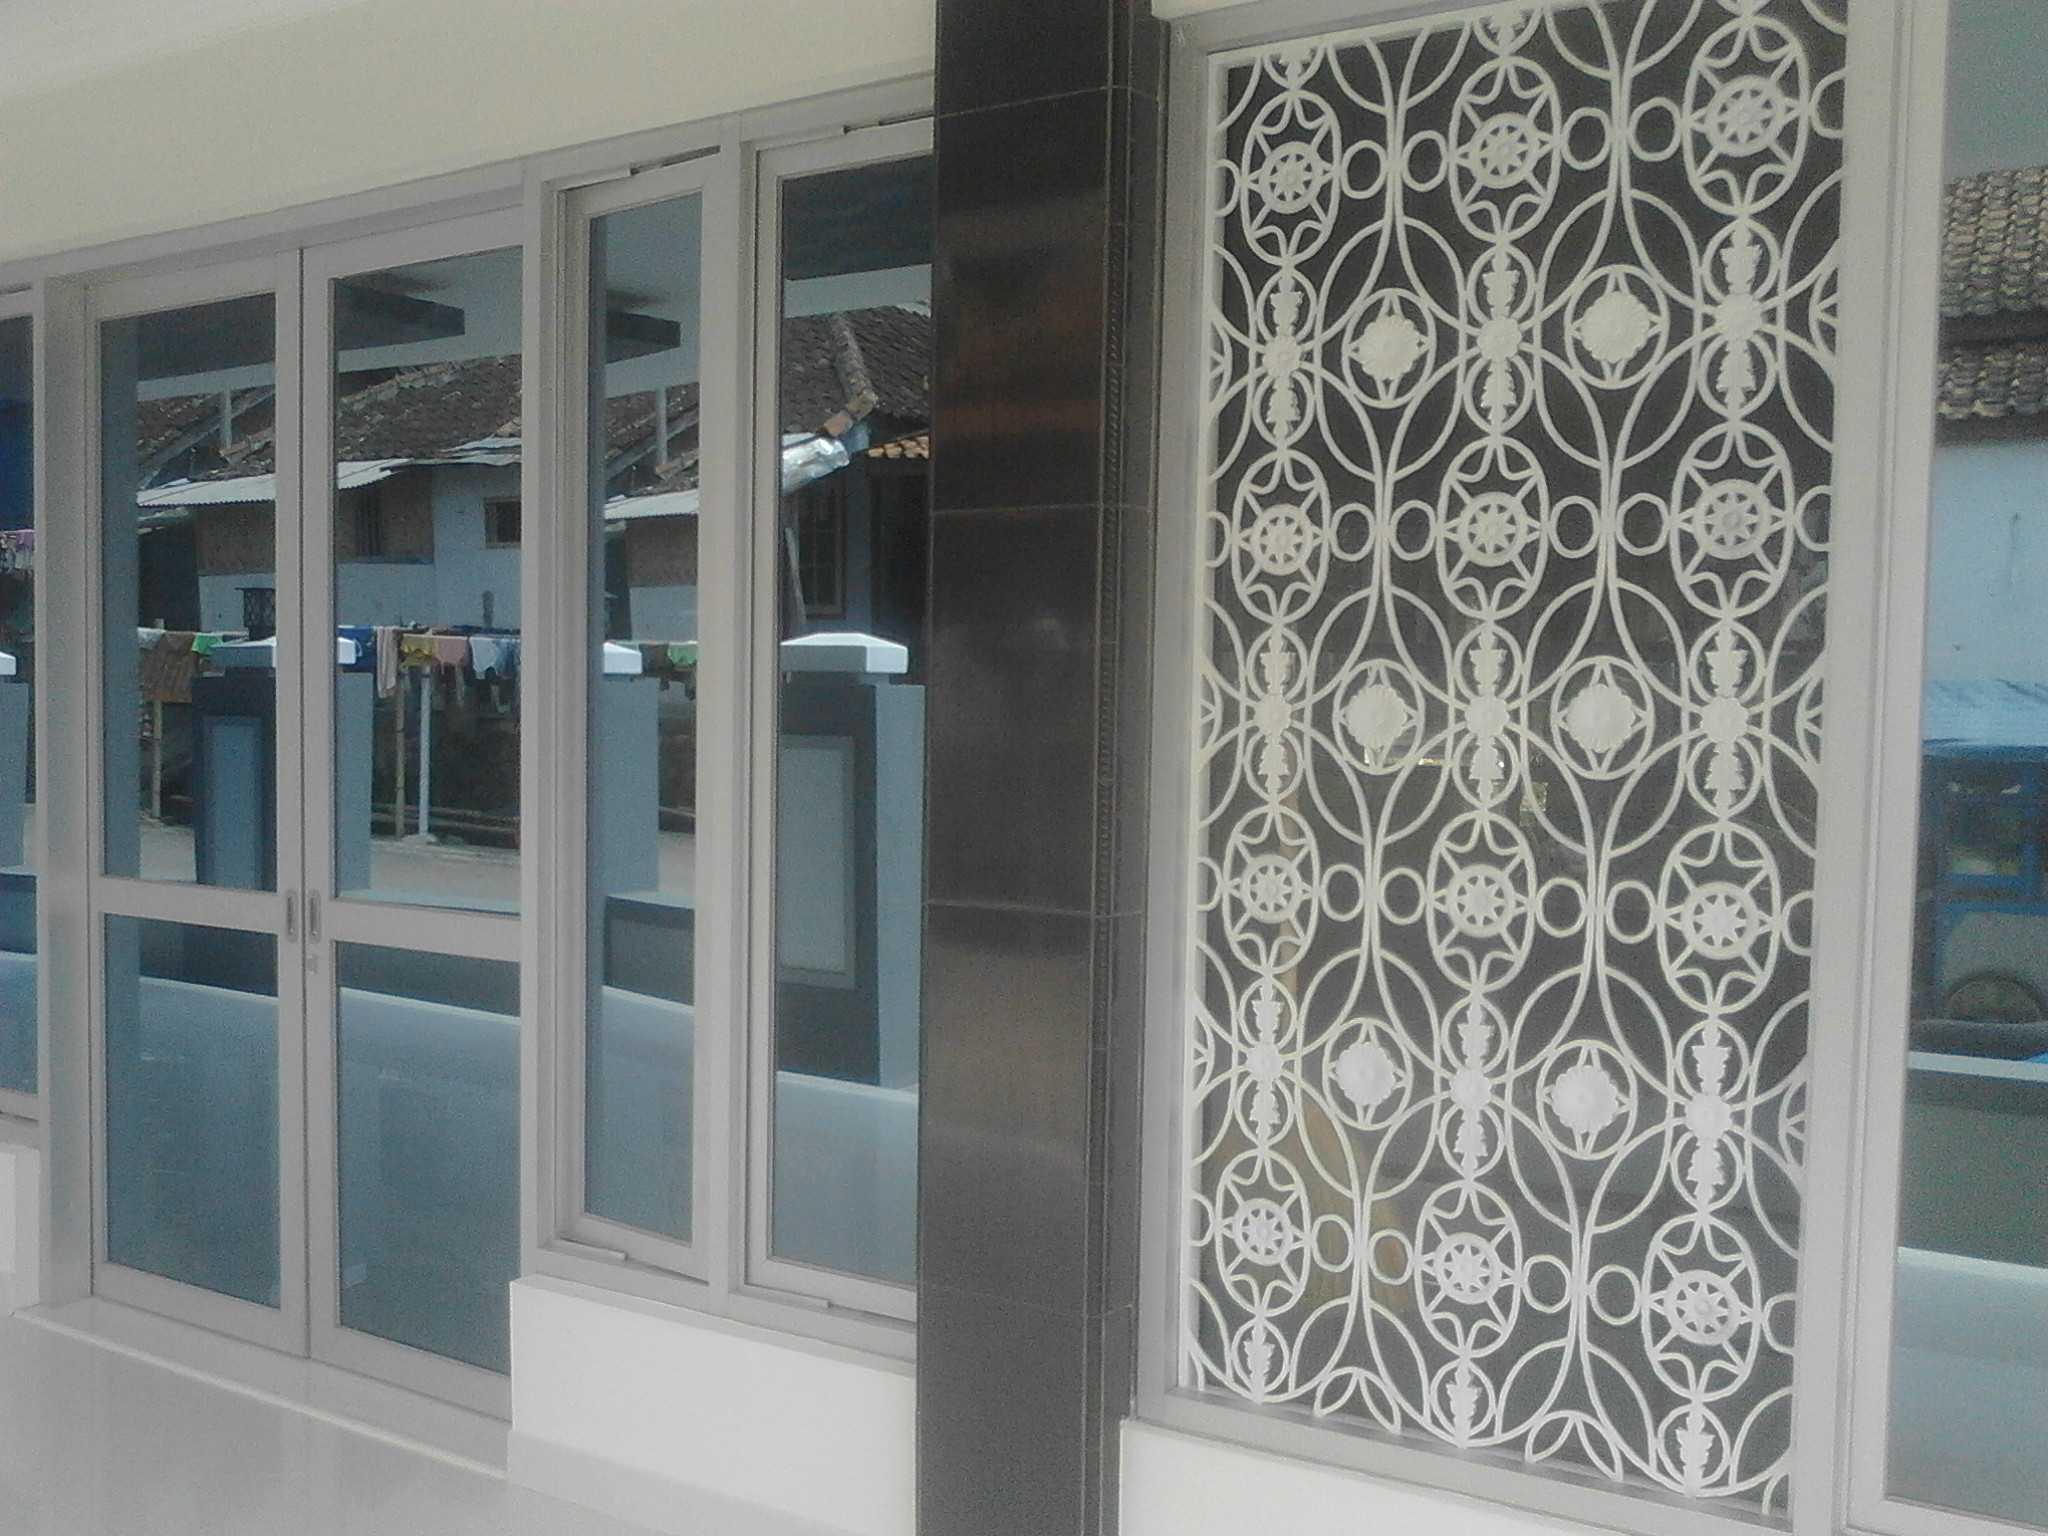 Archdesignbuild7 Mesjid Nasrullah  Soreang, West Java Soreang, West Java Img20170109103420 Modern  20783